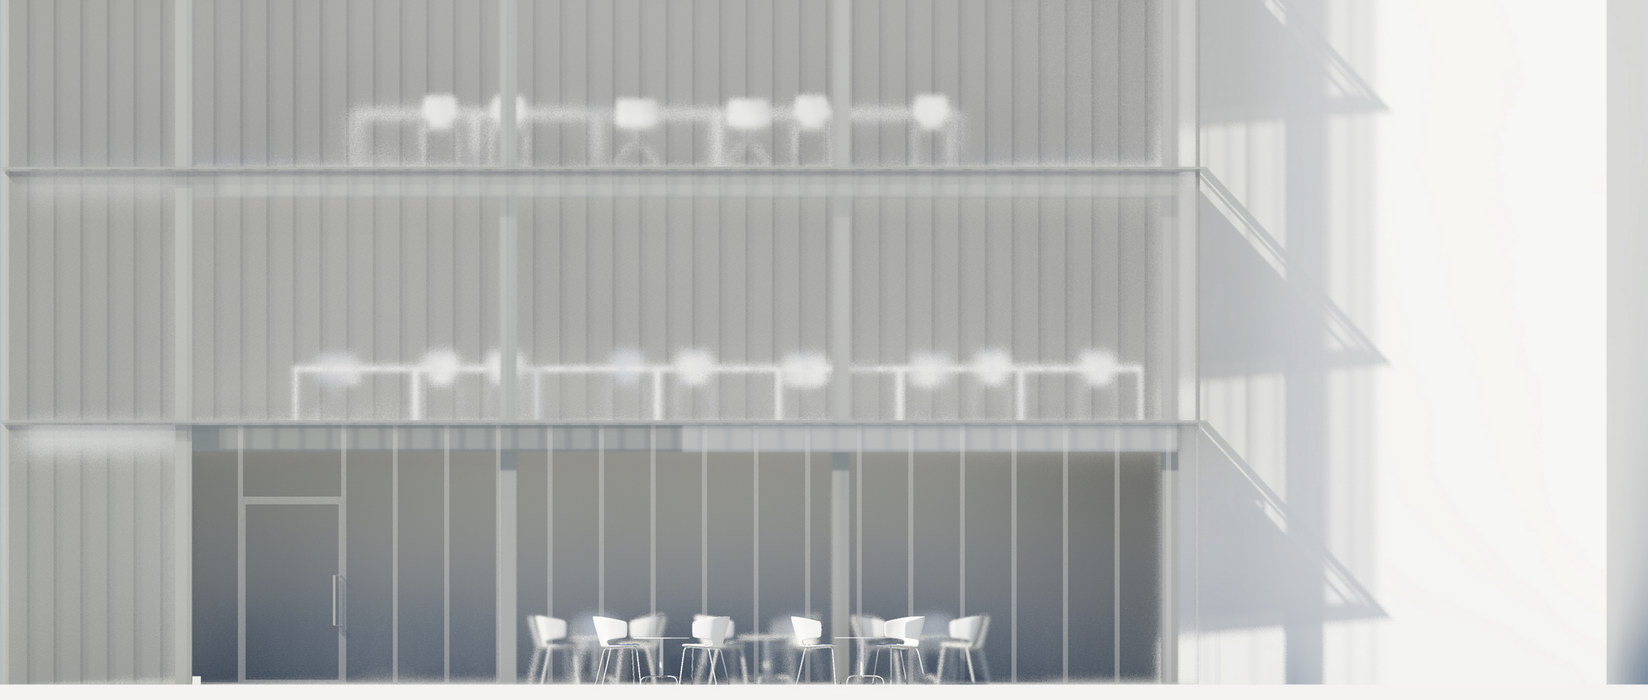 intro-crisan architecture-012_resize